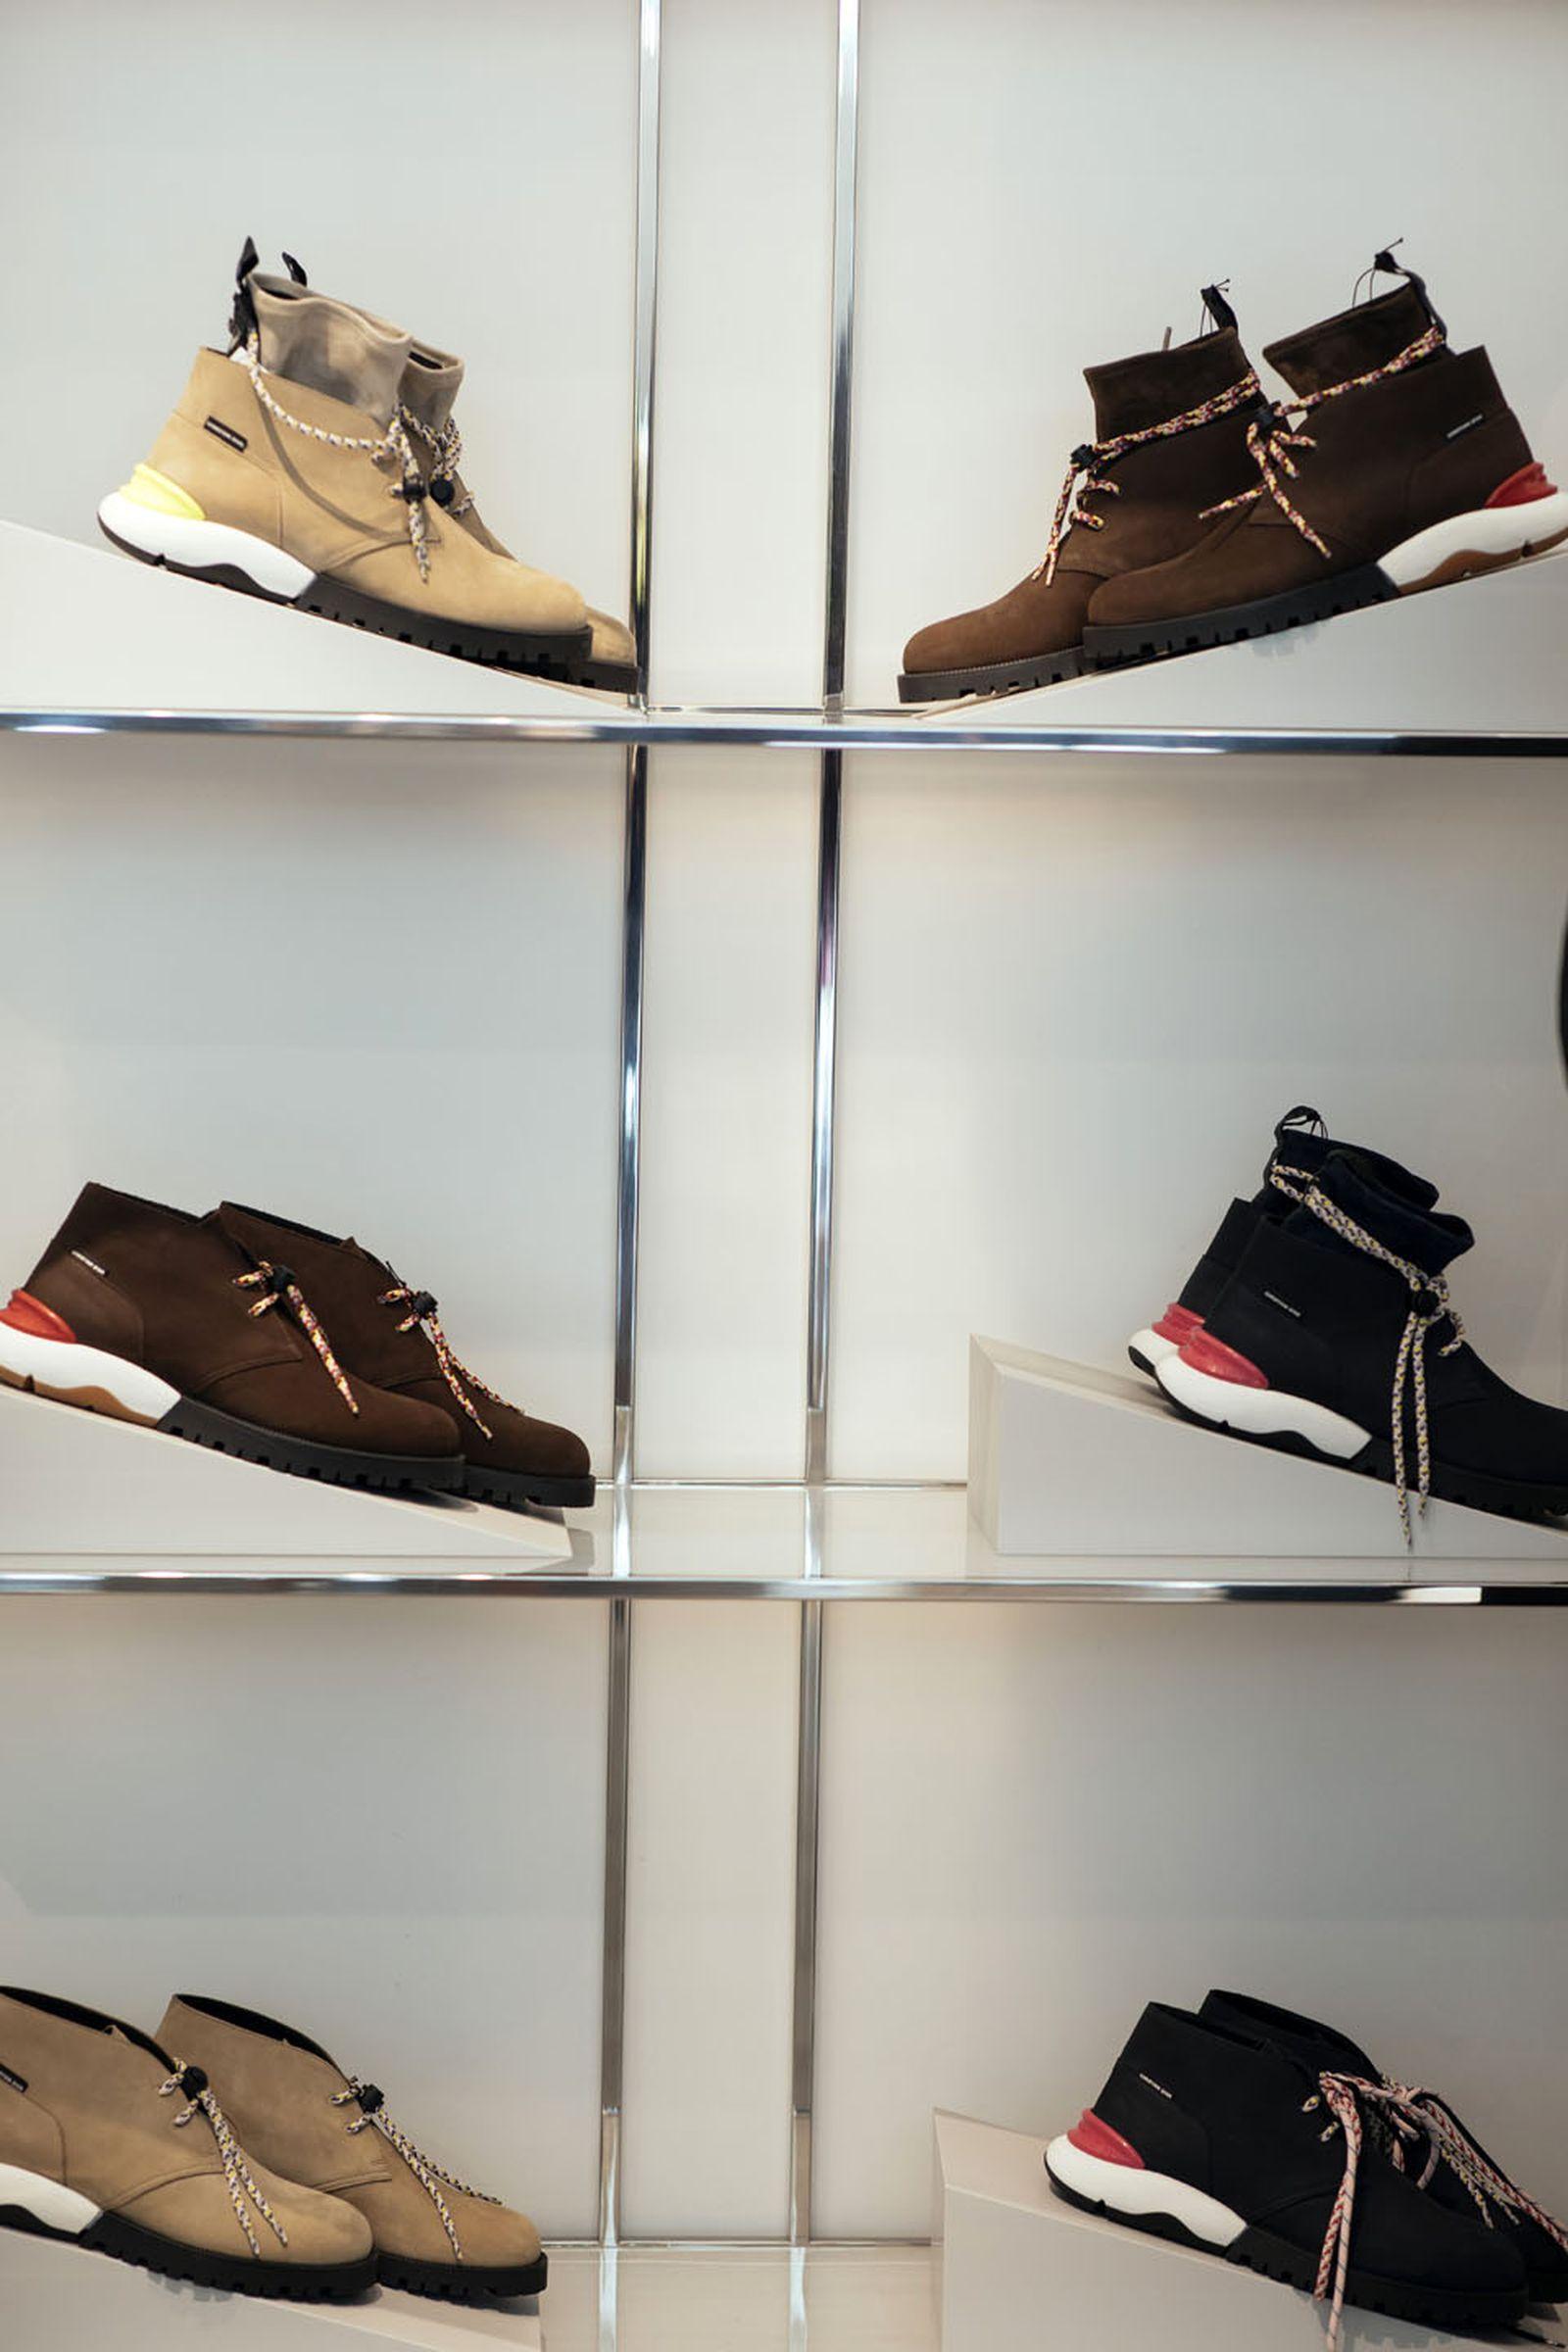 dior ss19 sneakers6 kim jones